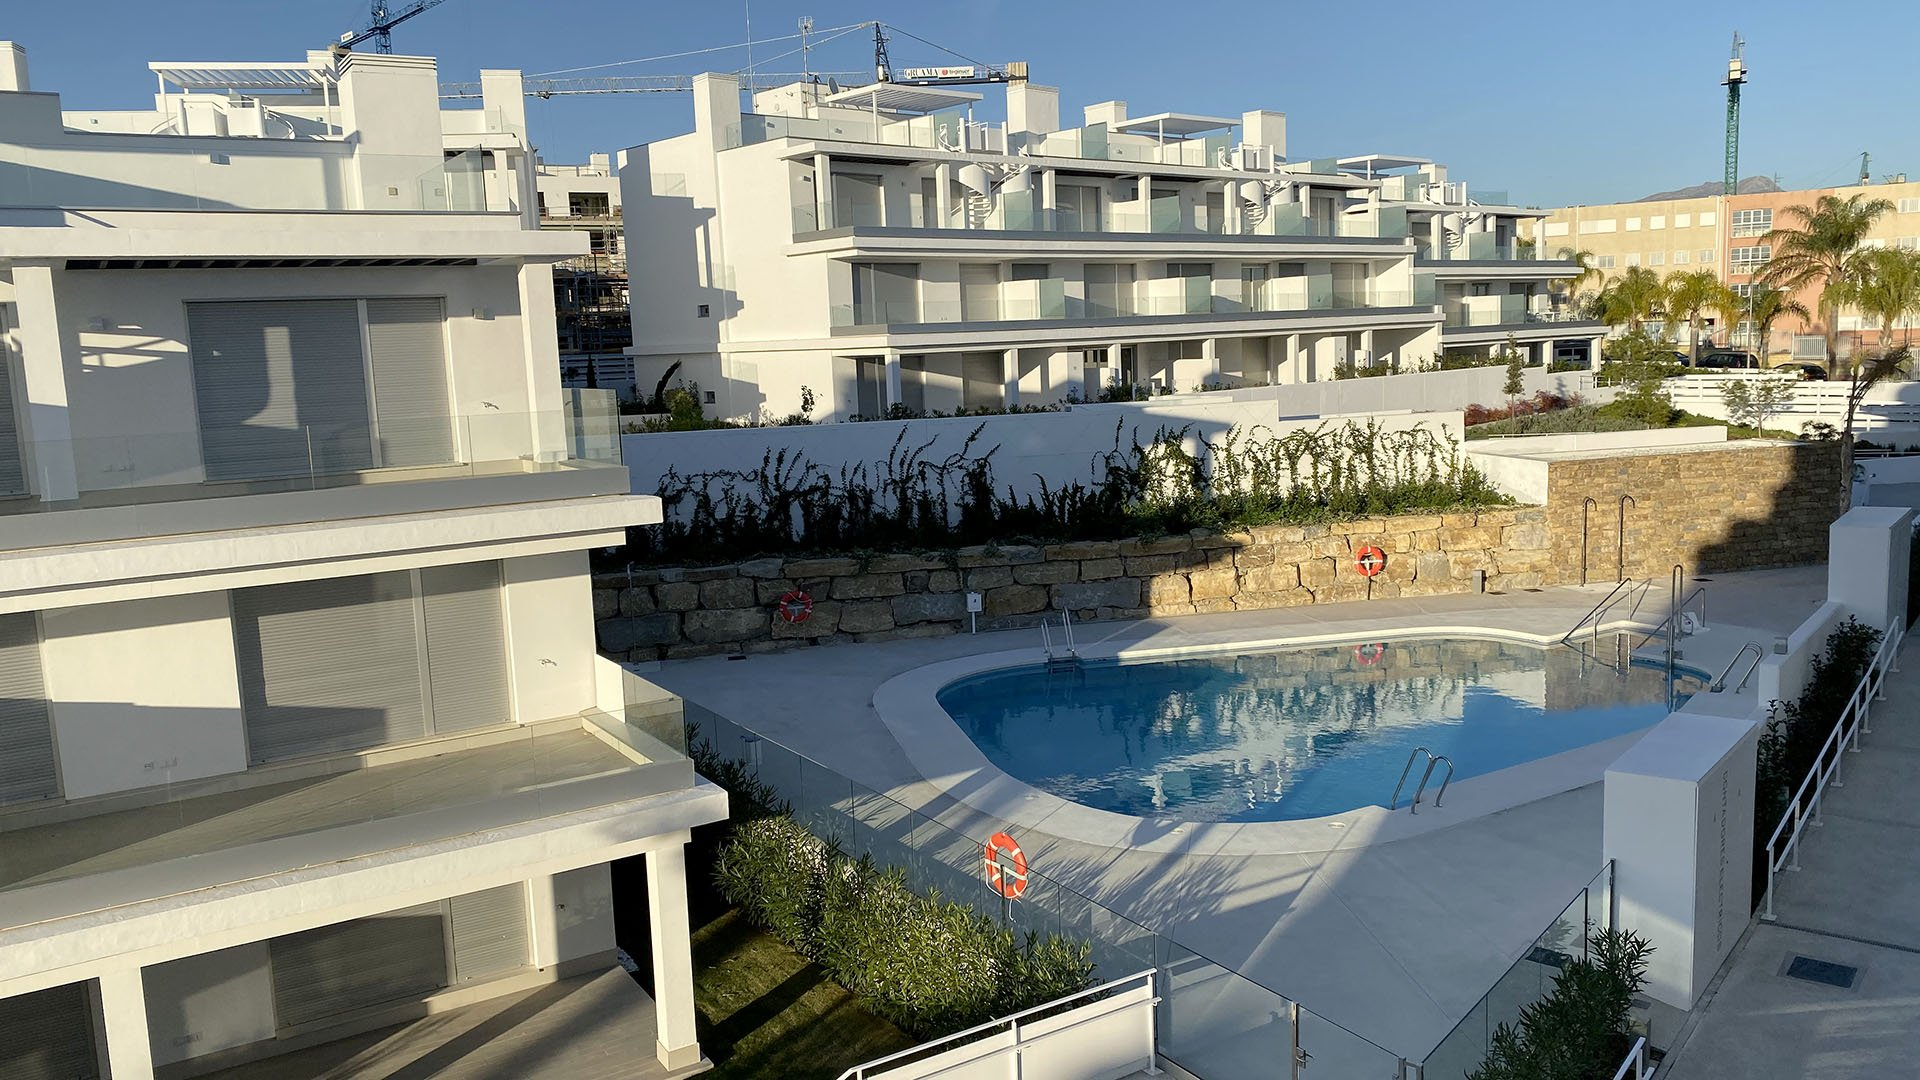 Le Mirage: Penthouse met ruim terras in Cancelada, Estepona